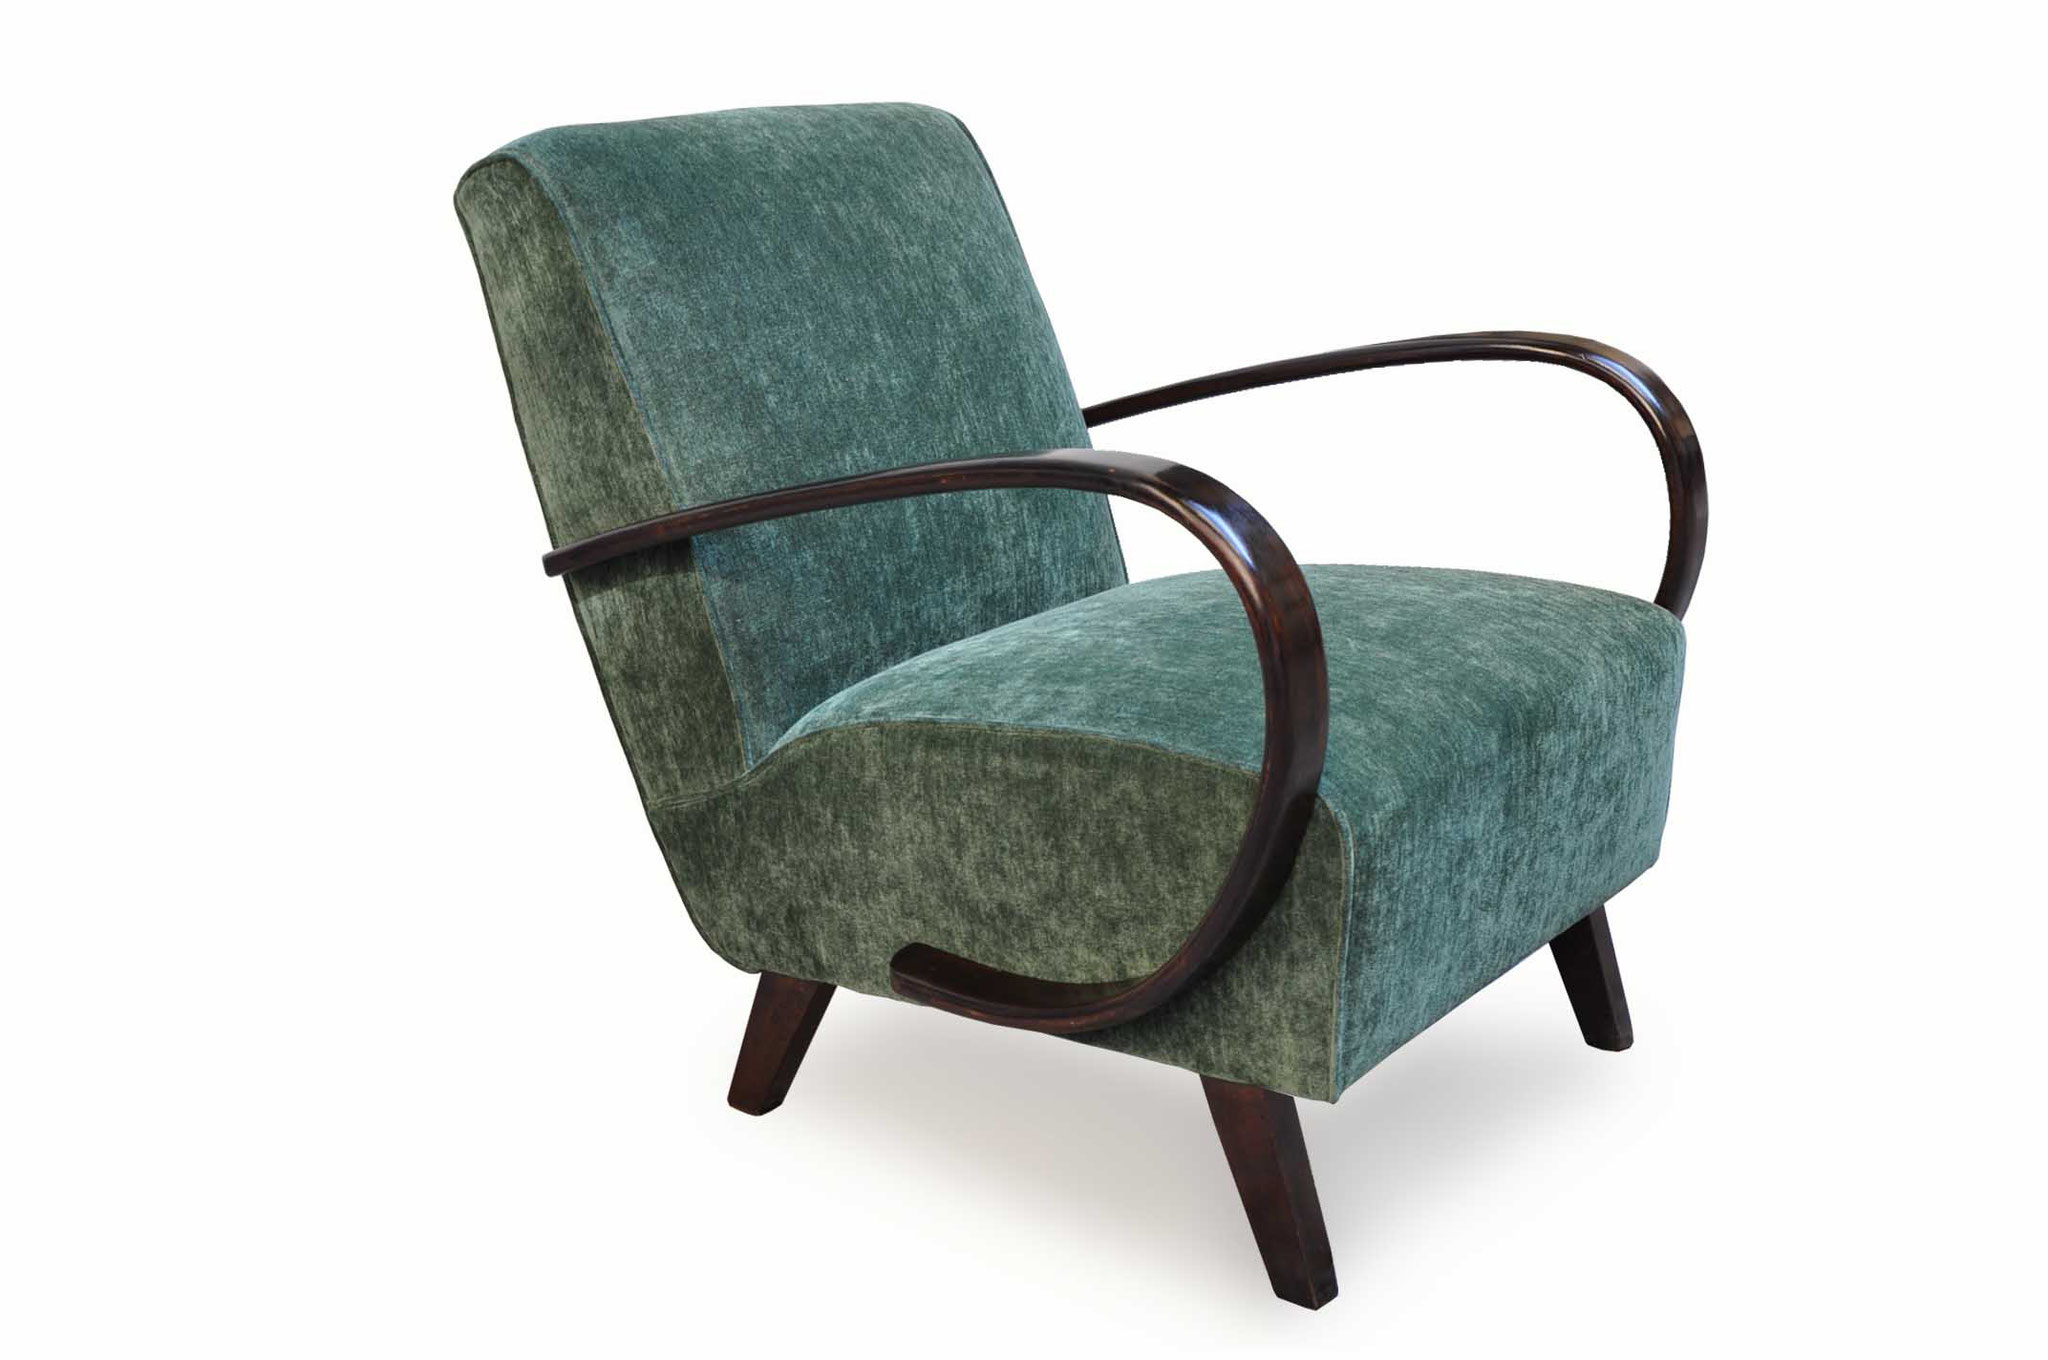 art deco chair in green chenille